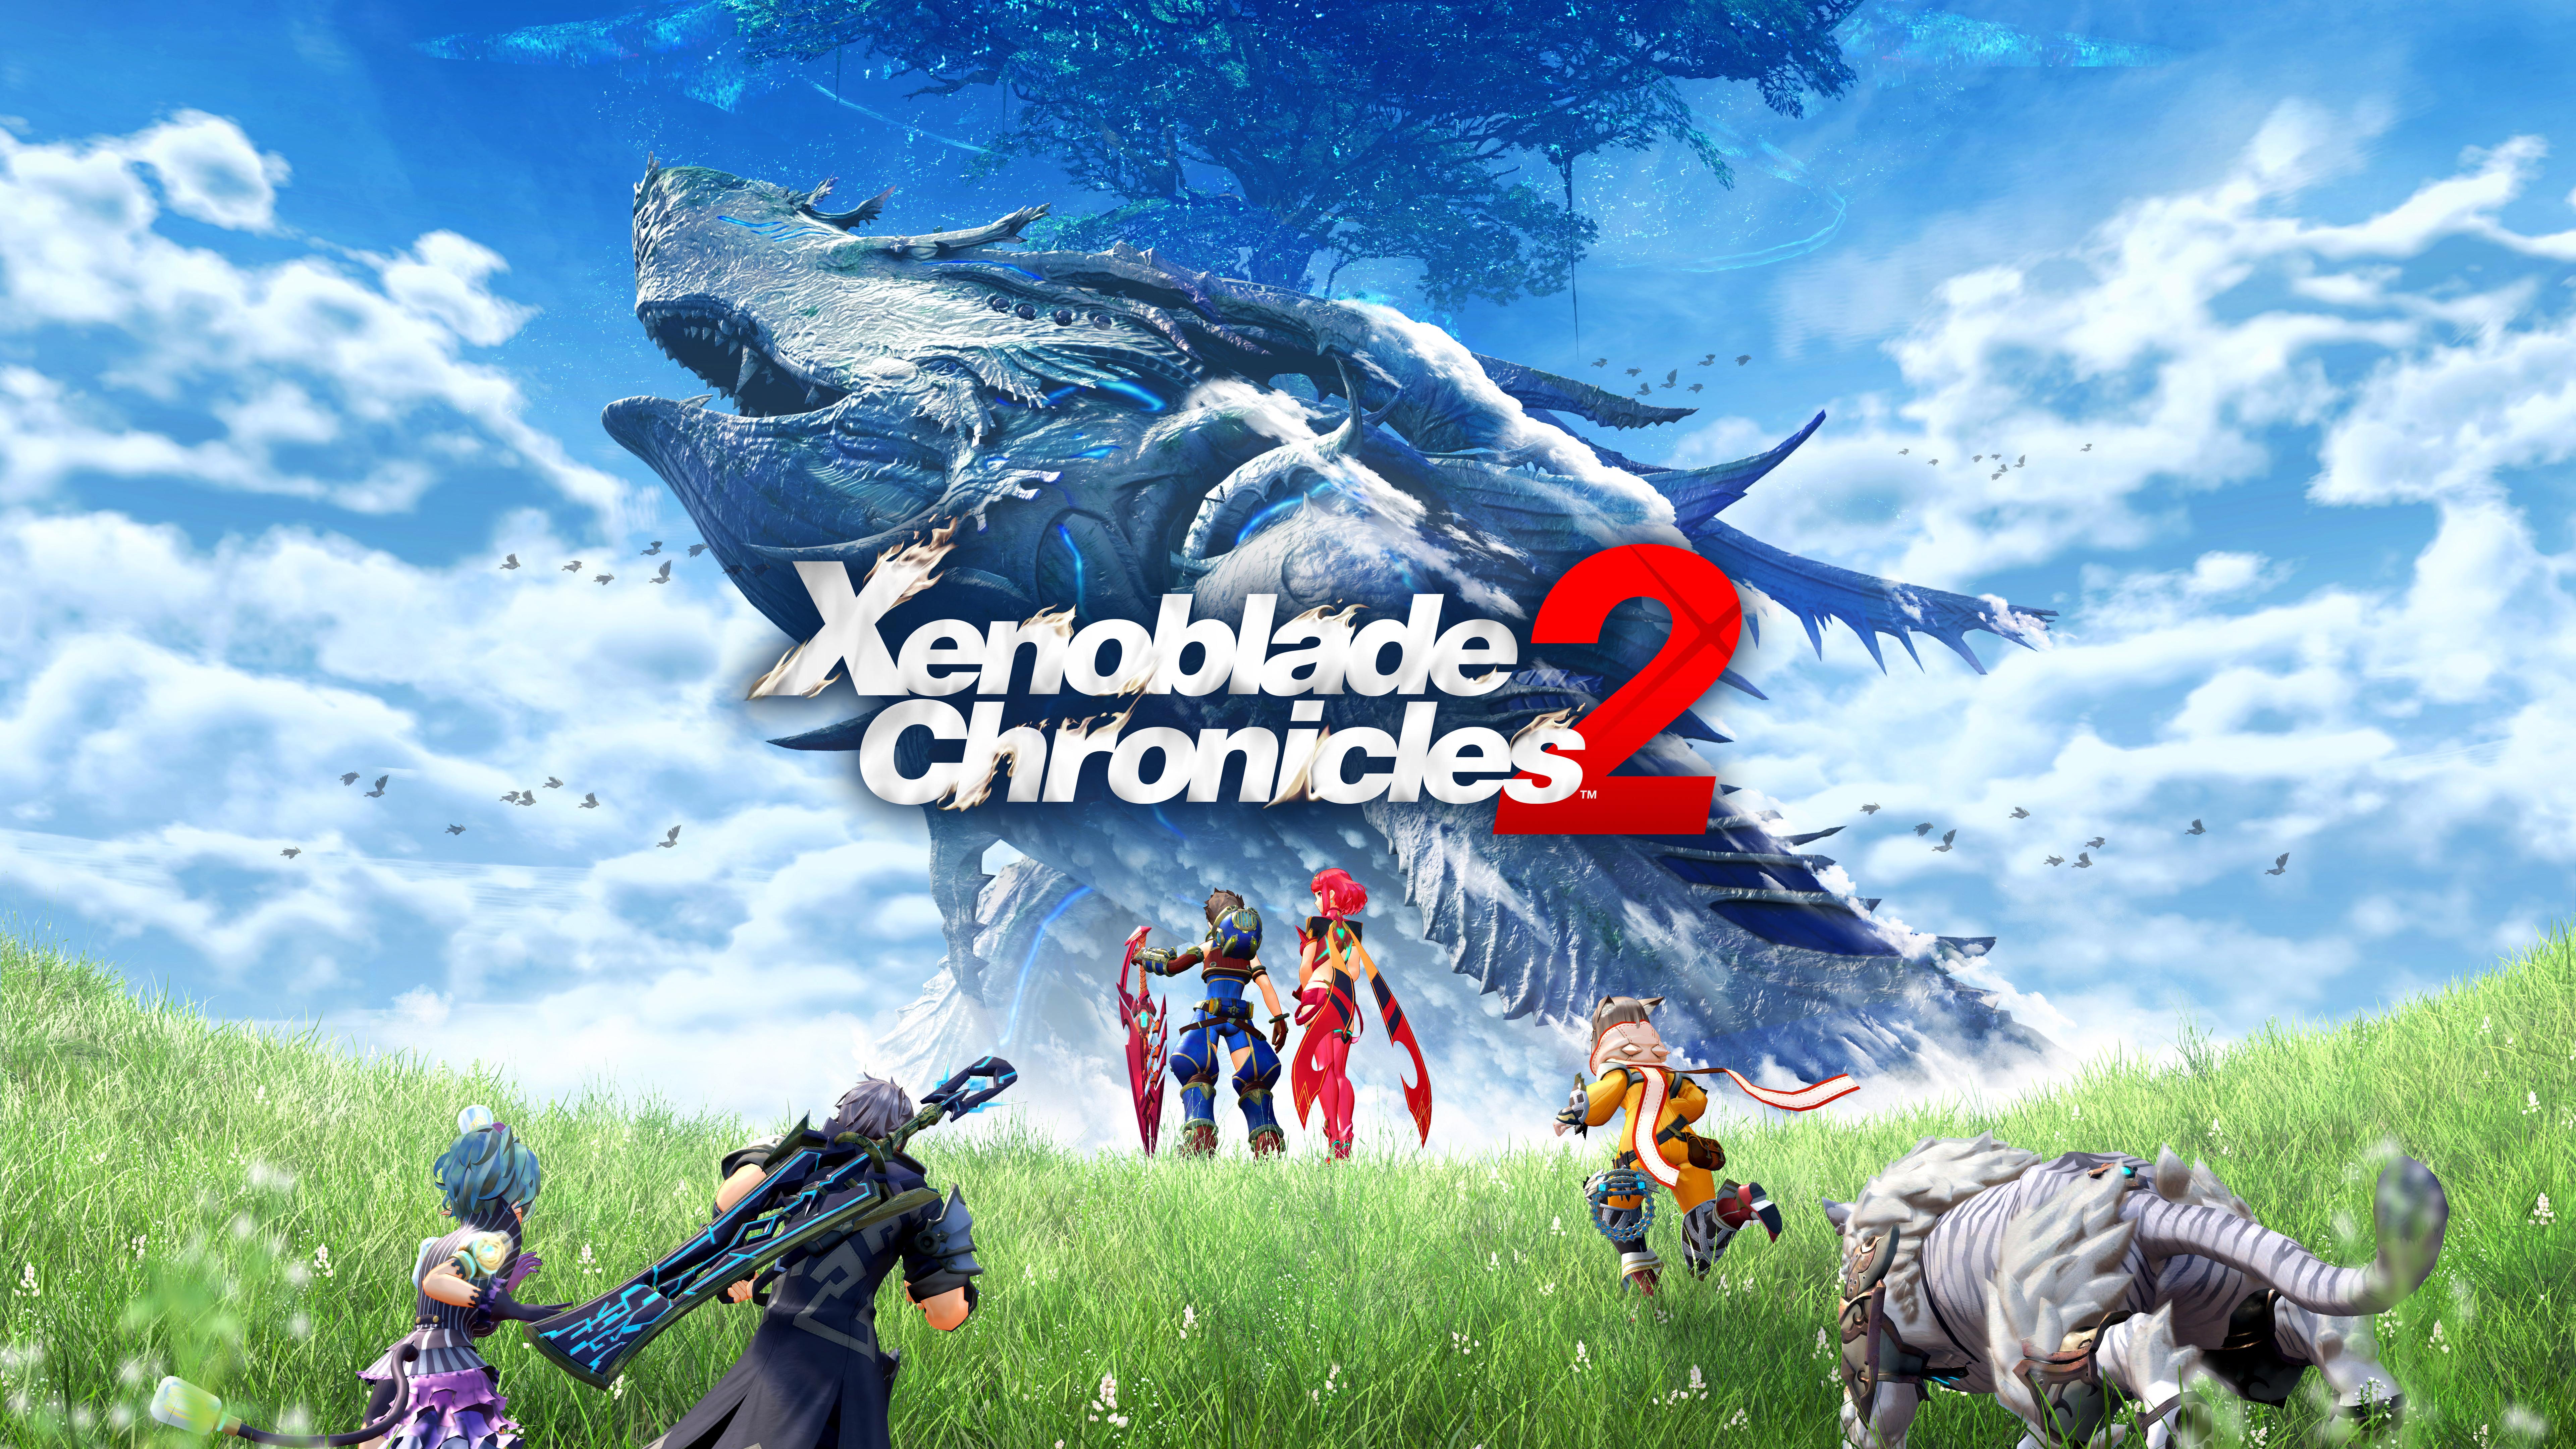 7680x4320 Xenoblade Chronicles 2 8k HD 4k Wallpapers ...